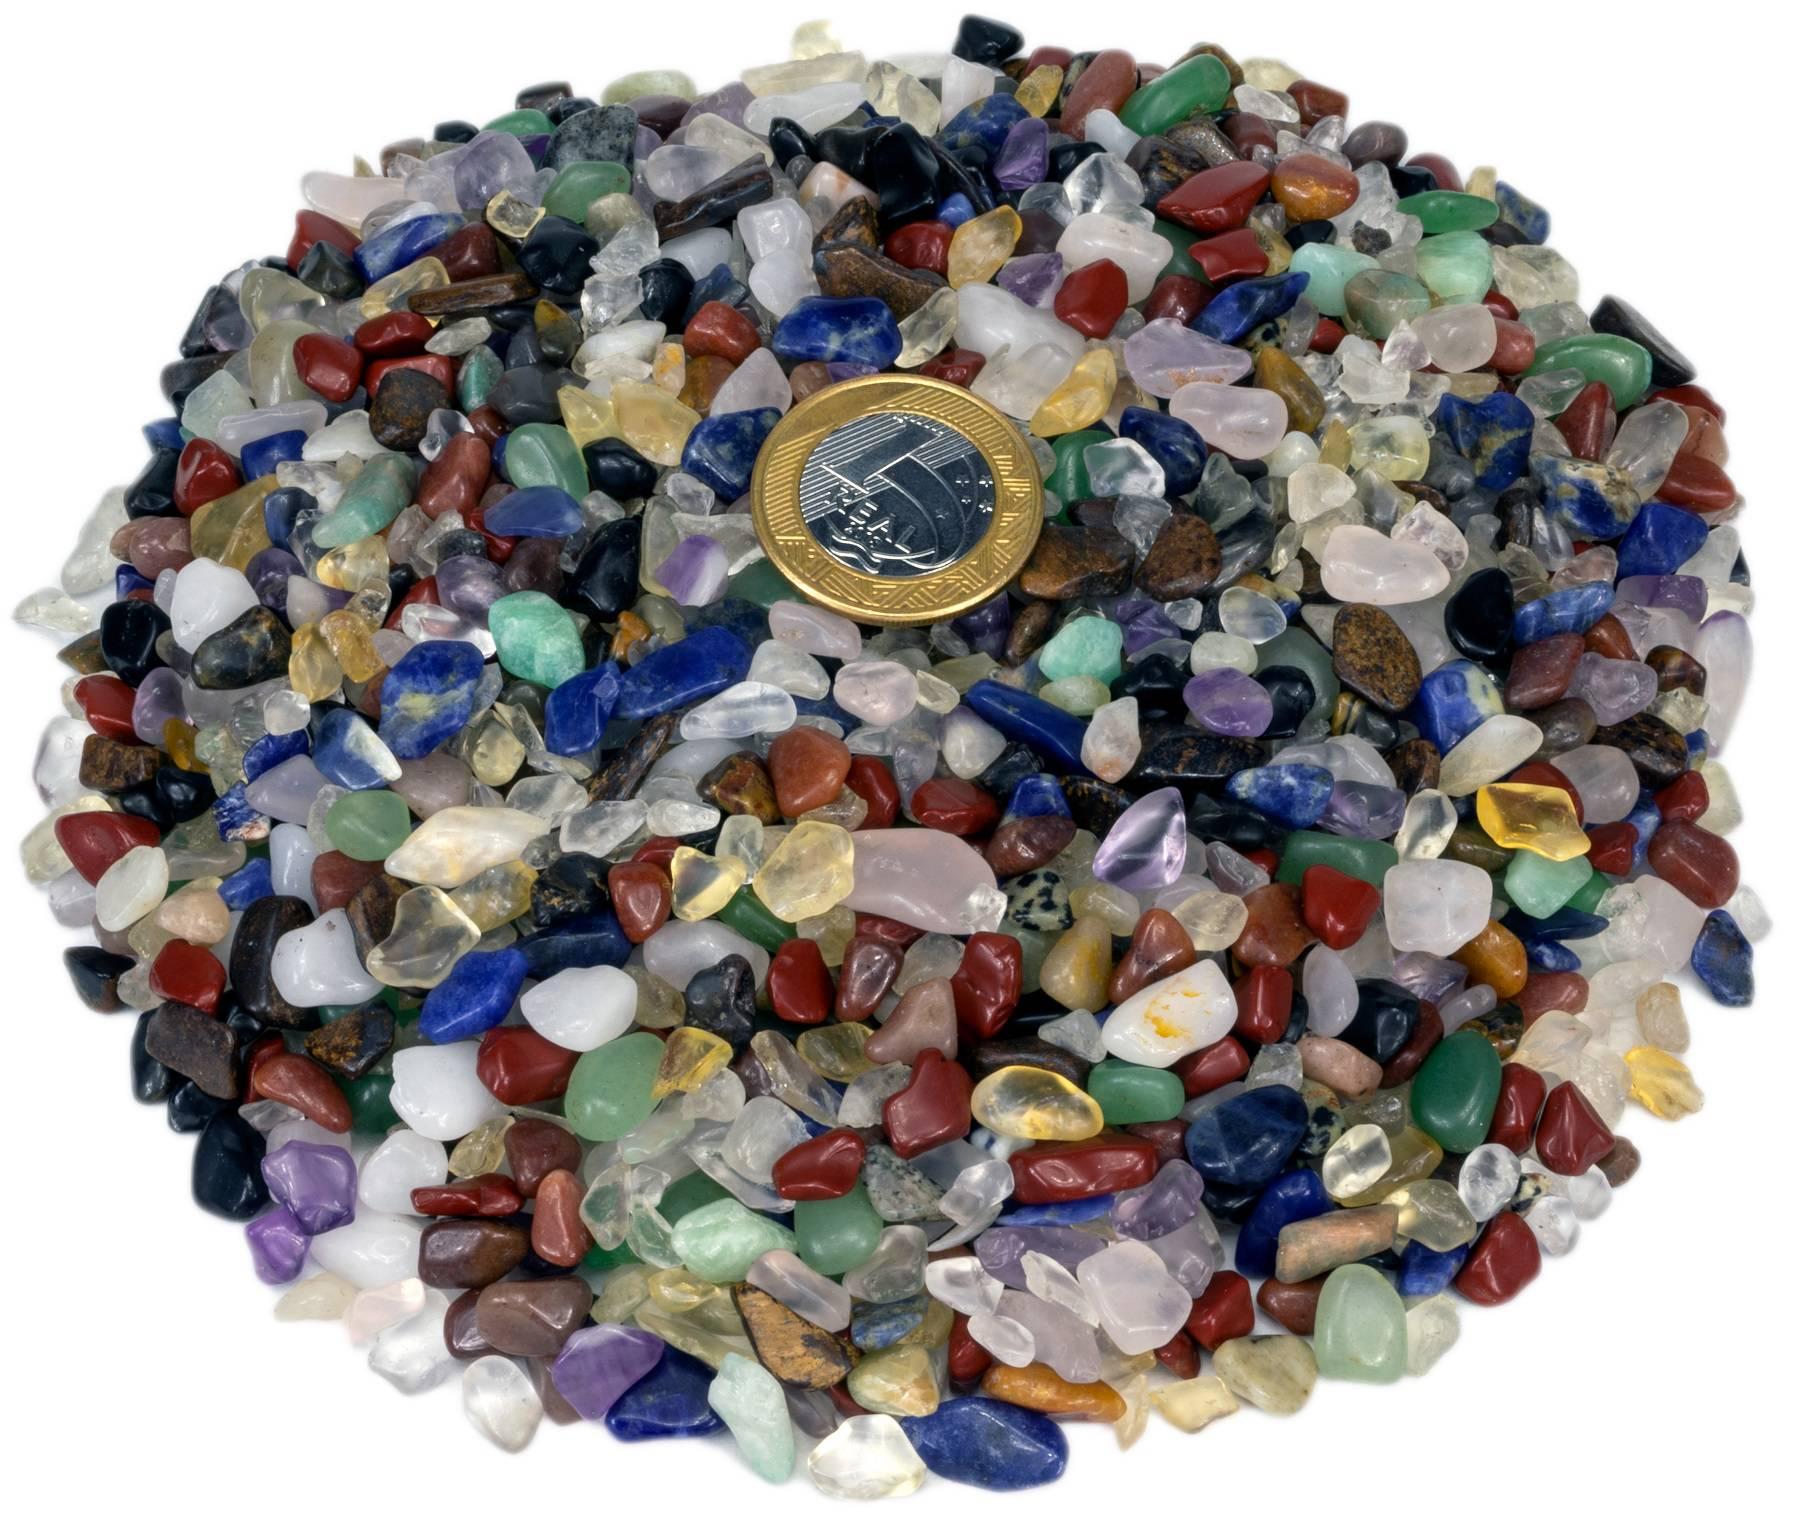 5kg De Cascalho De Pedra Rolada Natural Sortida Mista